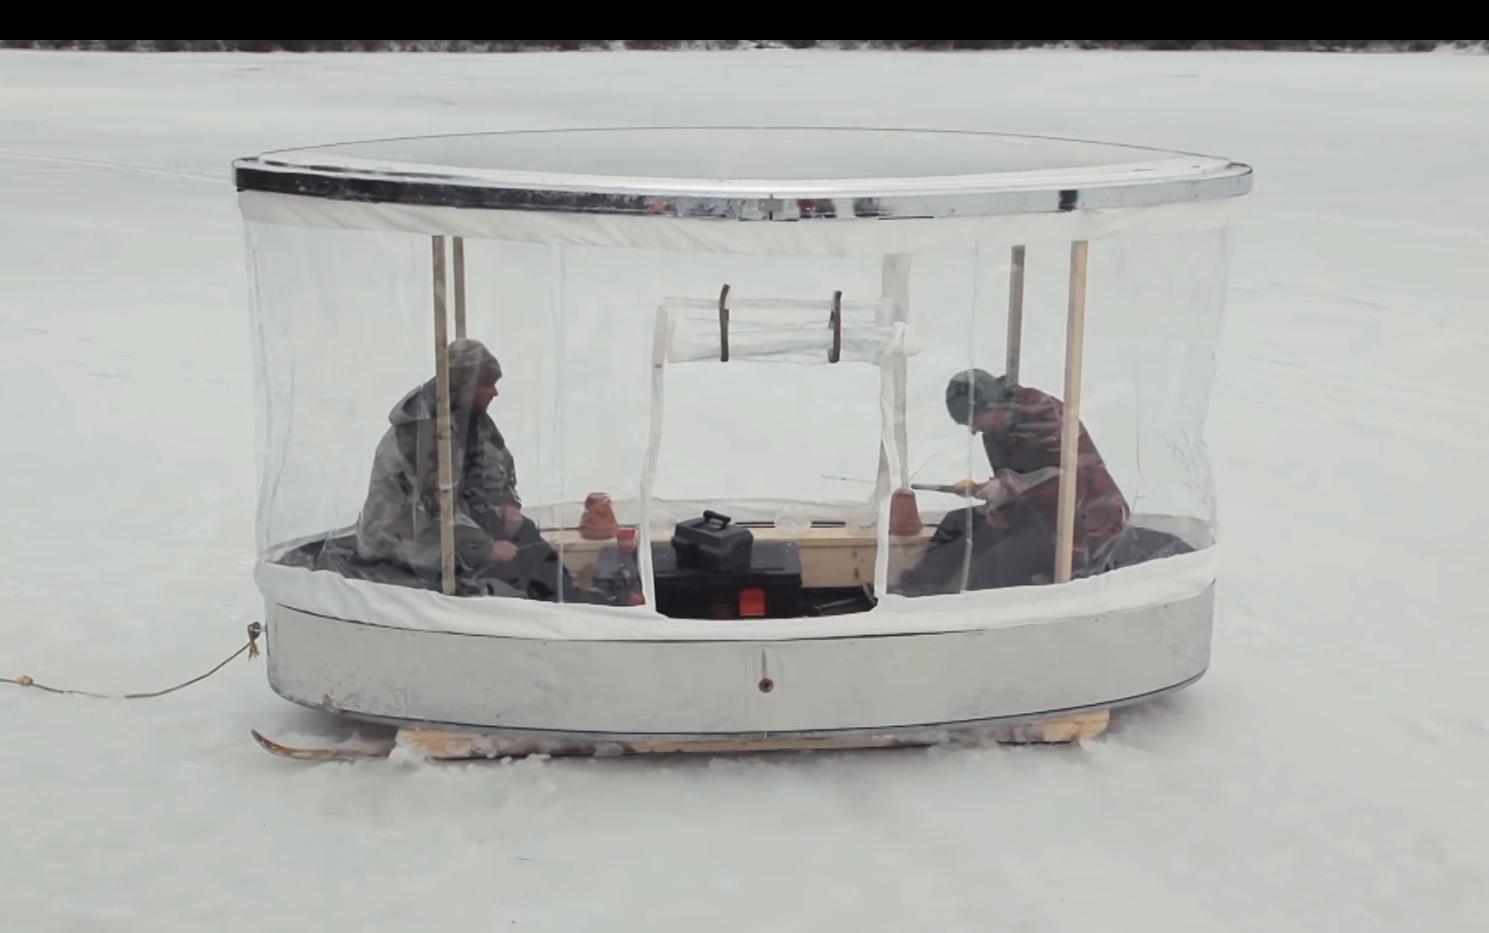 Portable Ice Fishing House